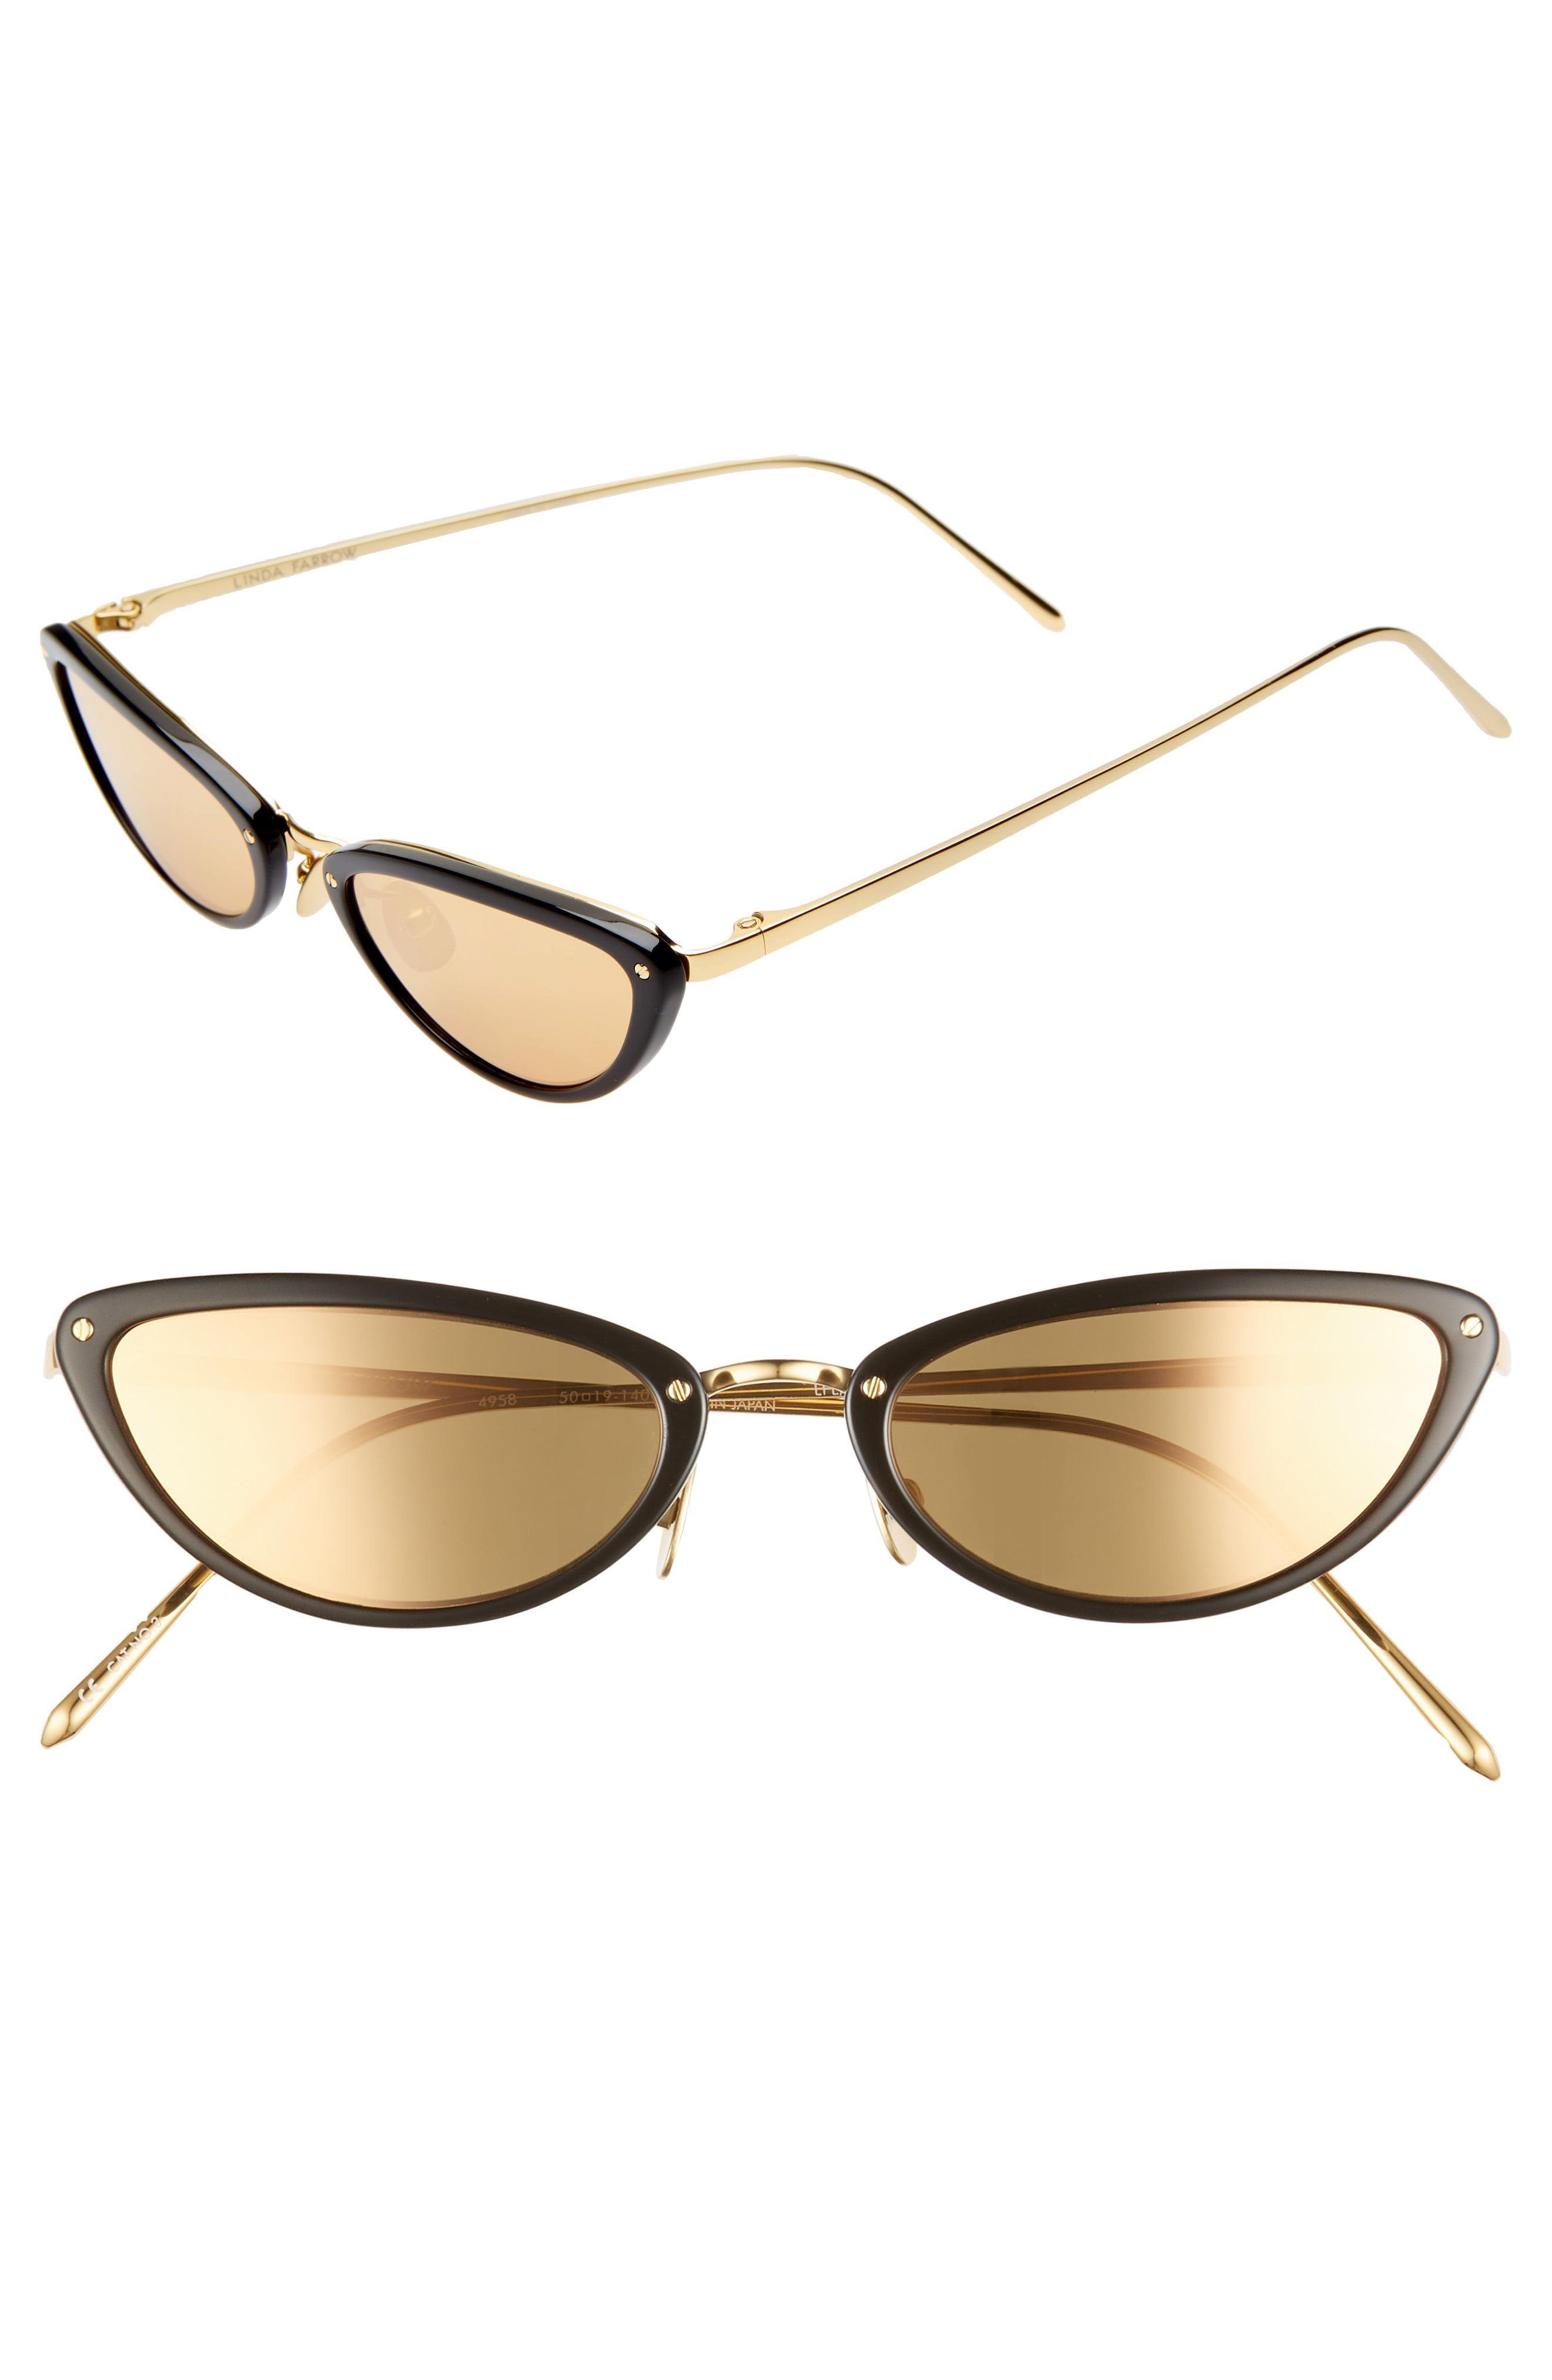 6e6c892403fe Lyst - Linda Farrow 50mm Cat Eye Gold Trim Sunglasses in Metallic